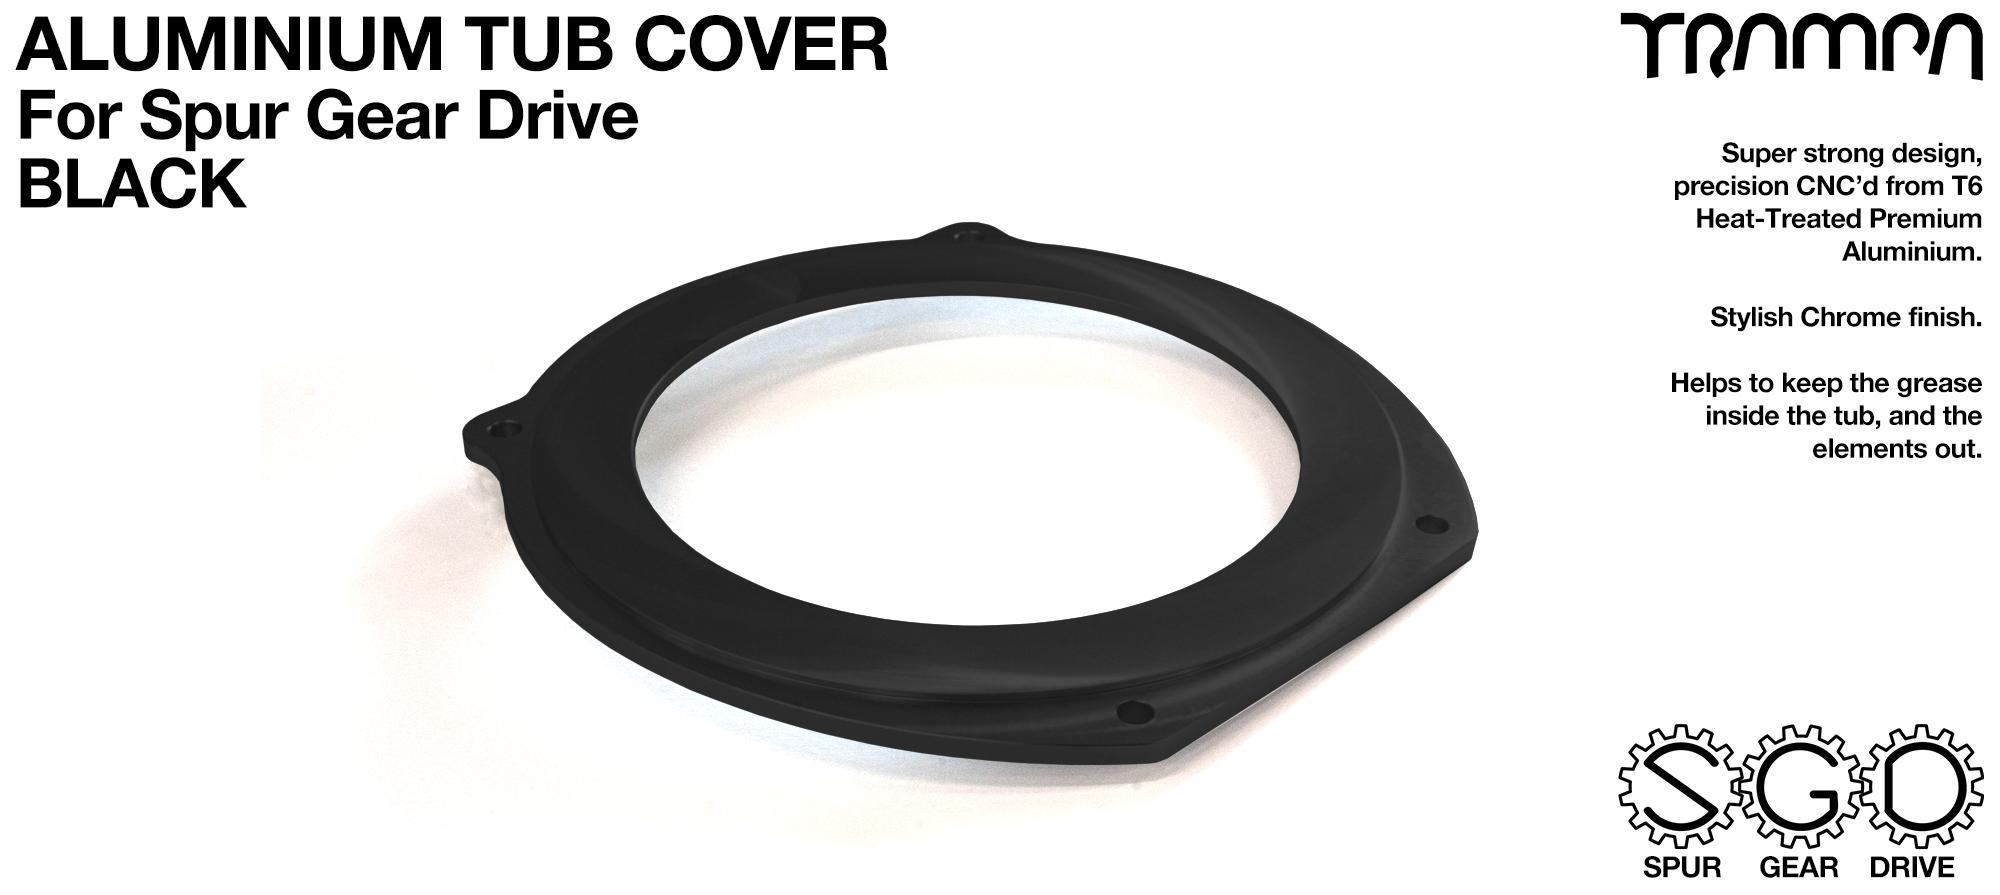 TRAMPA MKII Spur Gear Drive T6 Aluminium Tub Cover - BLACK